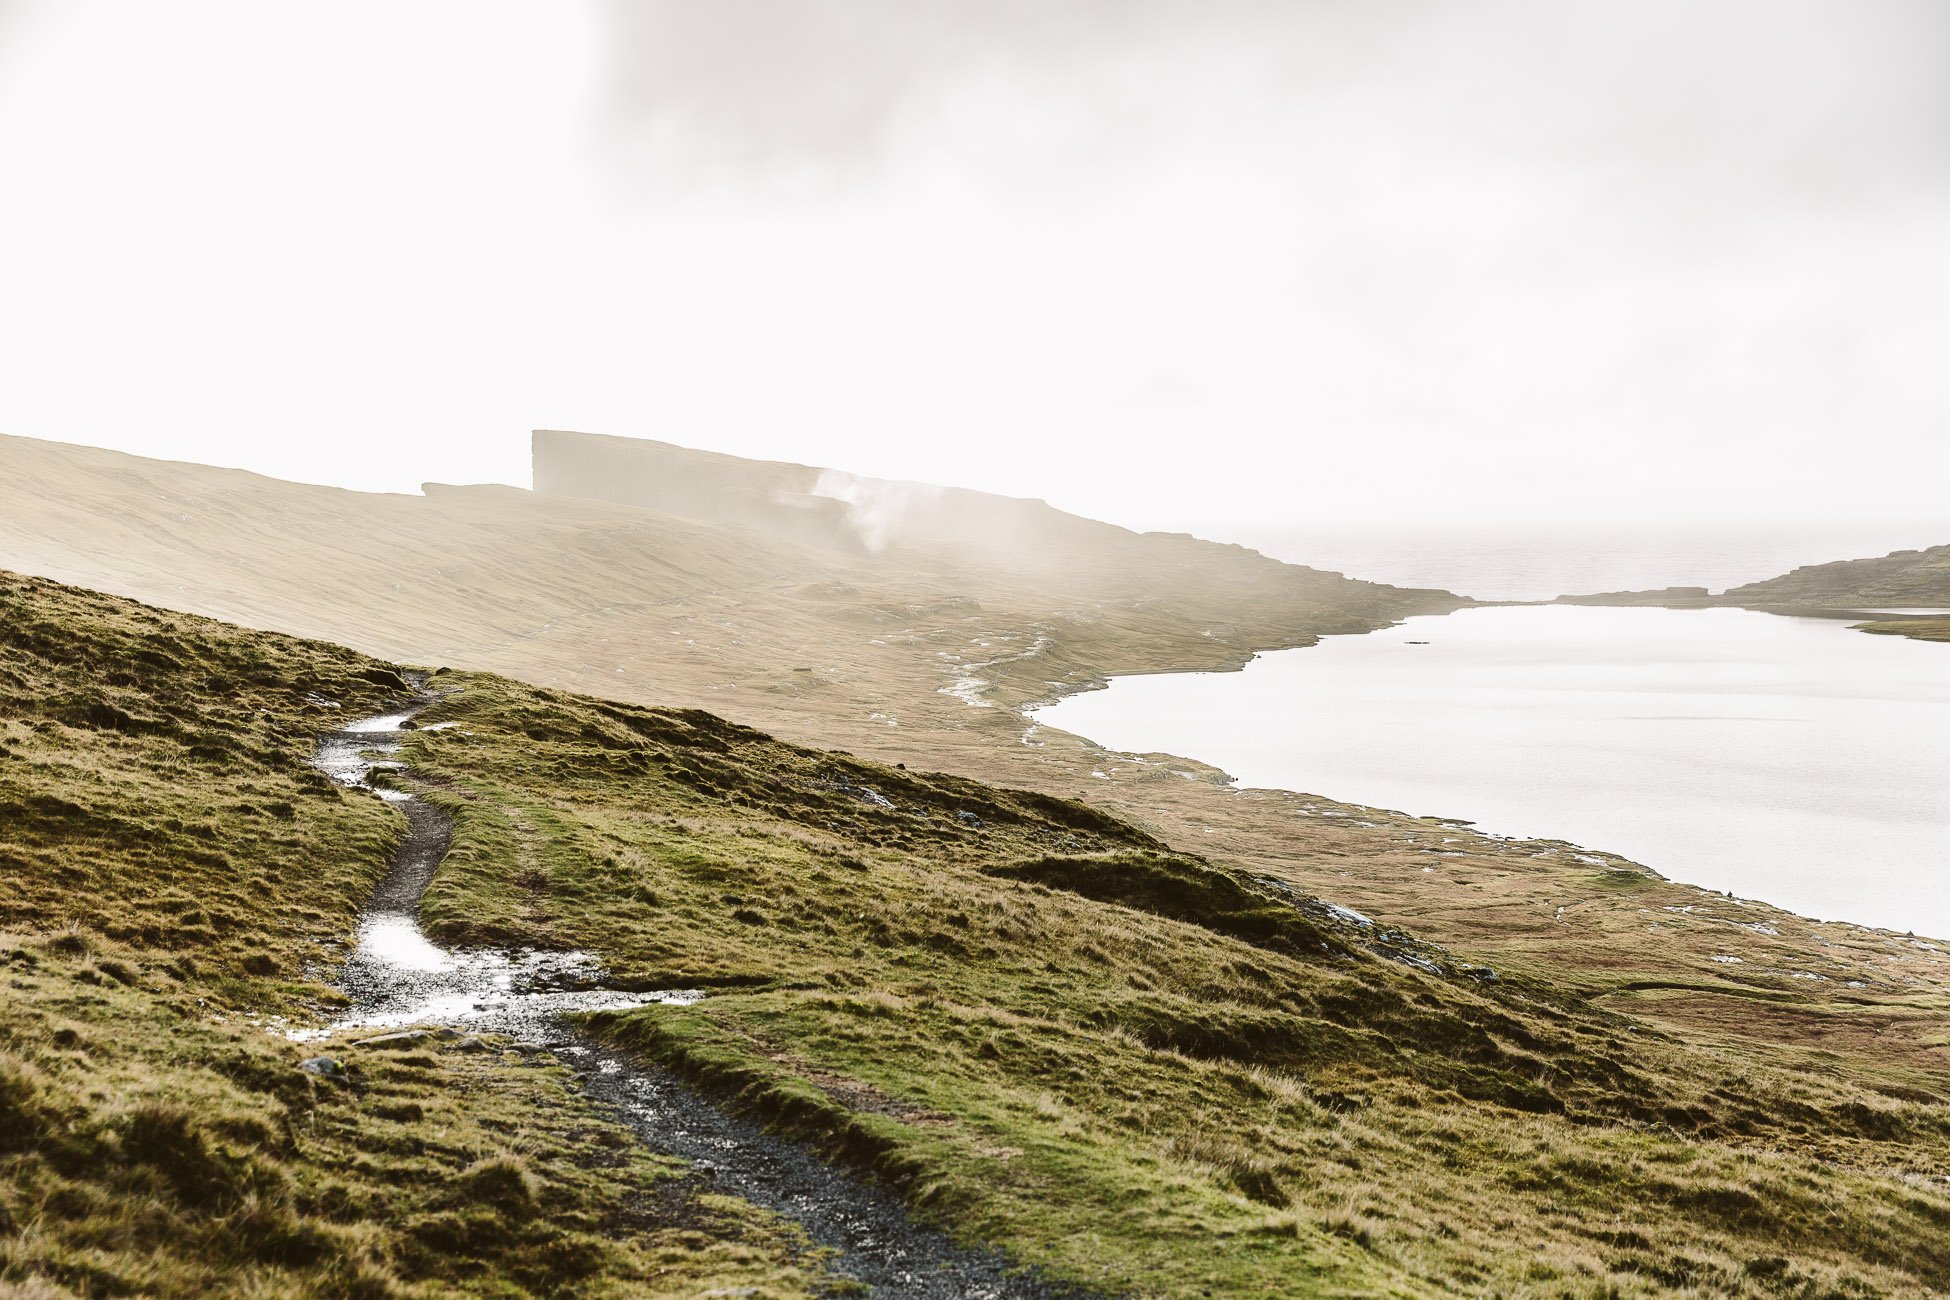 Faroe Islands Hike: Where lake and ocean meet Sørvágsvatn & Trælanípa